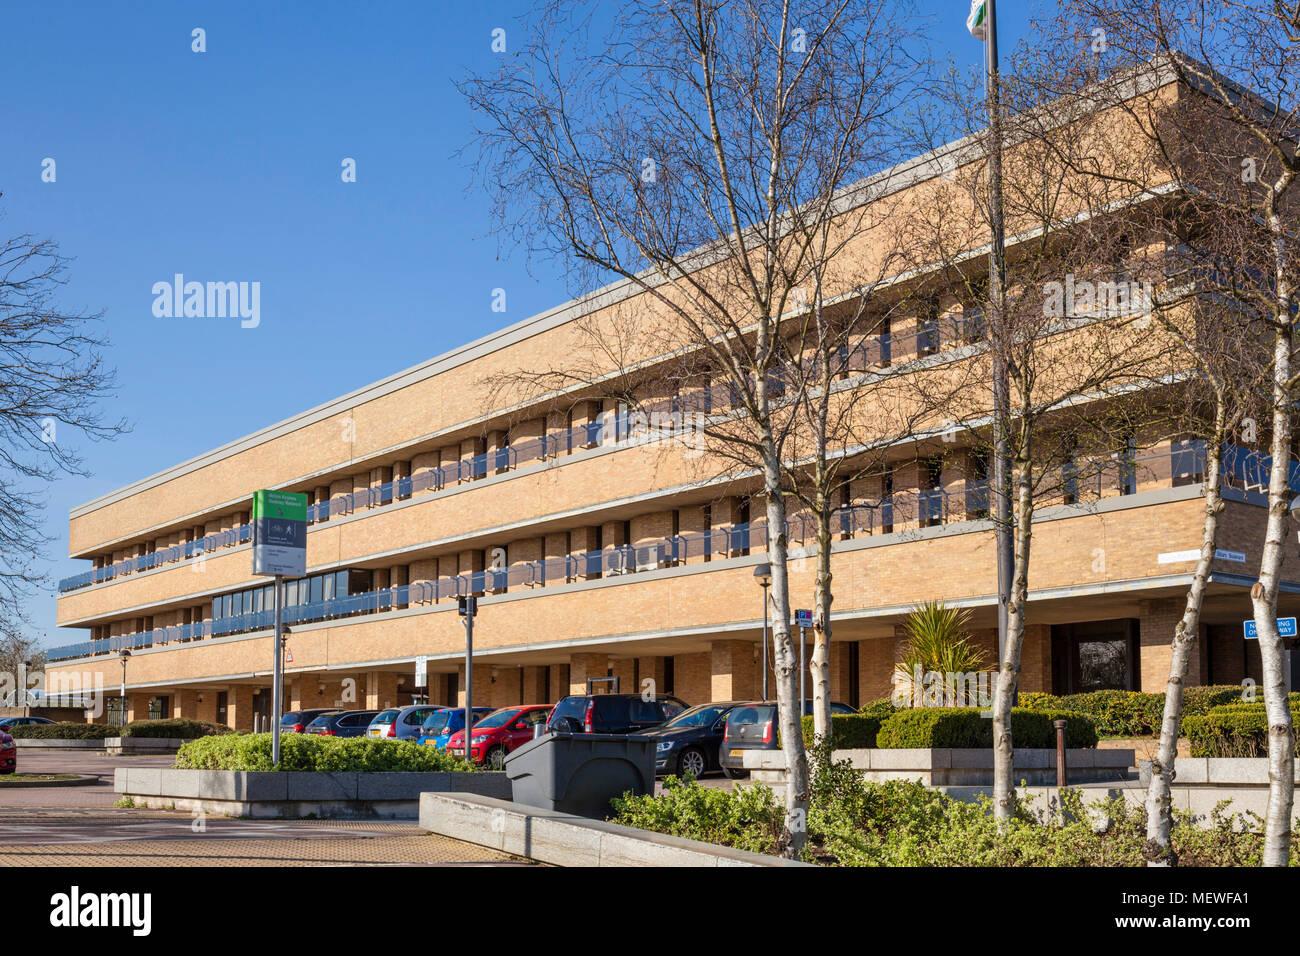 Milton Keynes England milton keynes council offices central milton keynes buckinghamshire england gb uk europe - Stock Image